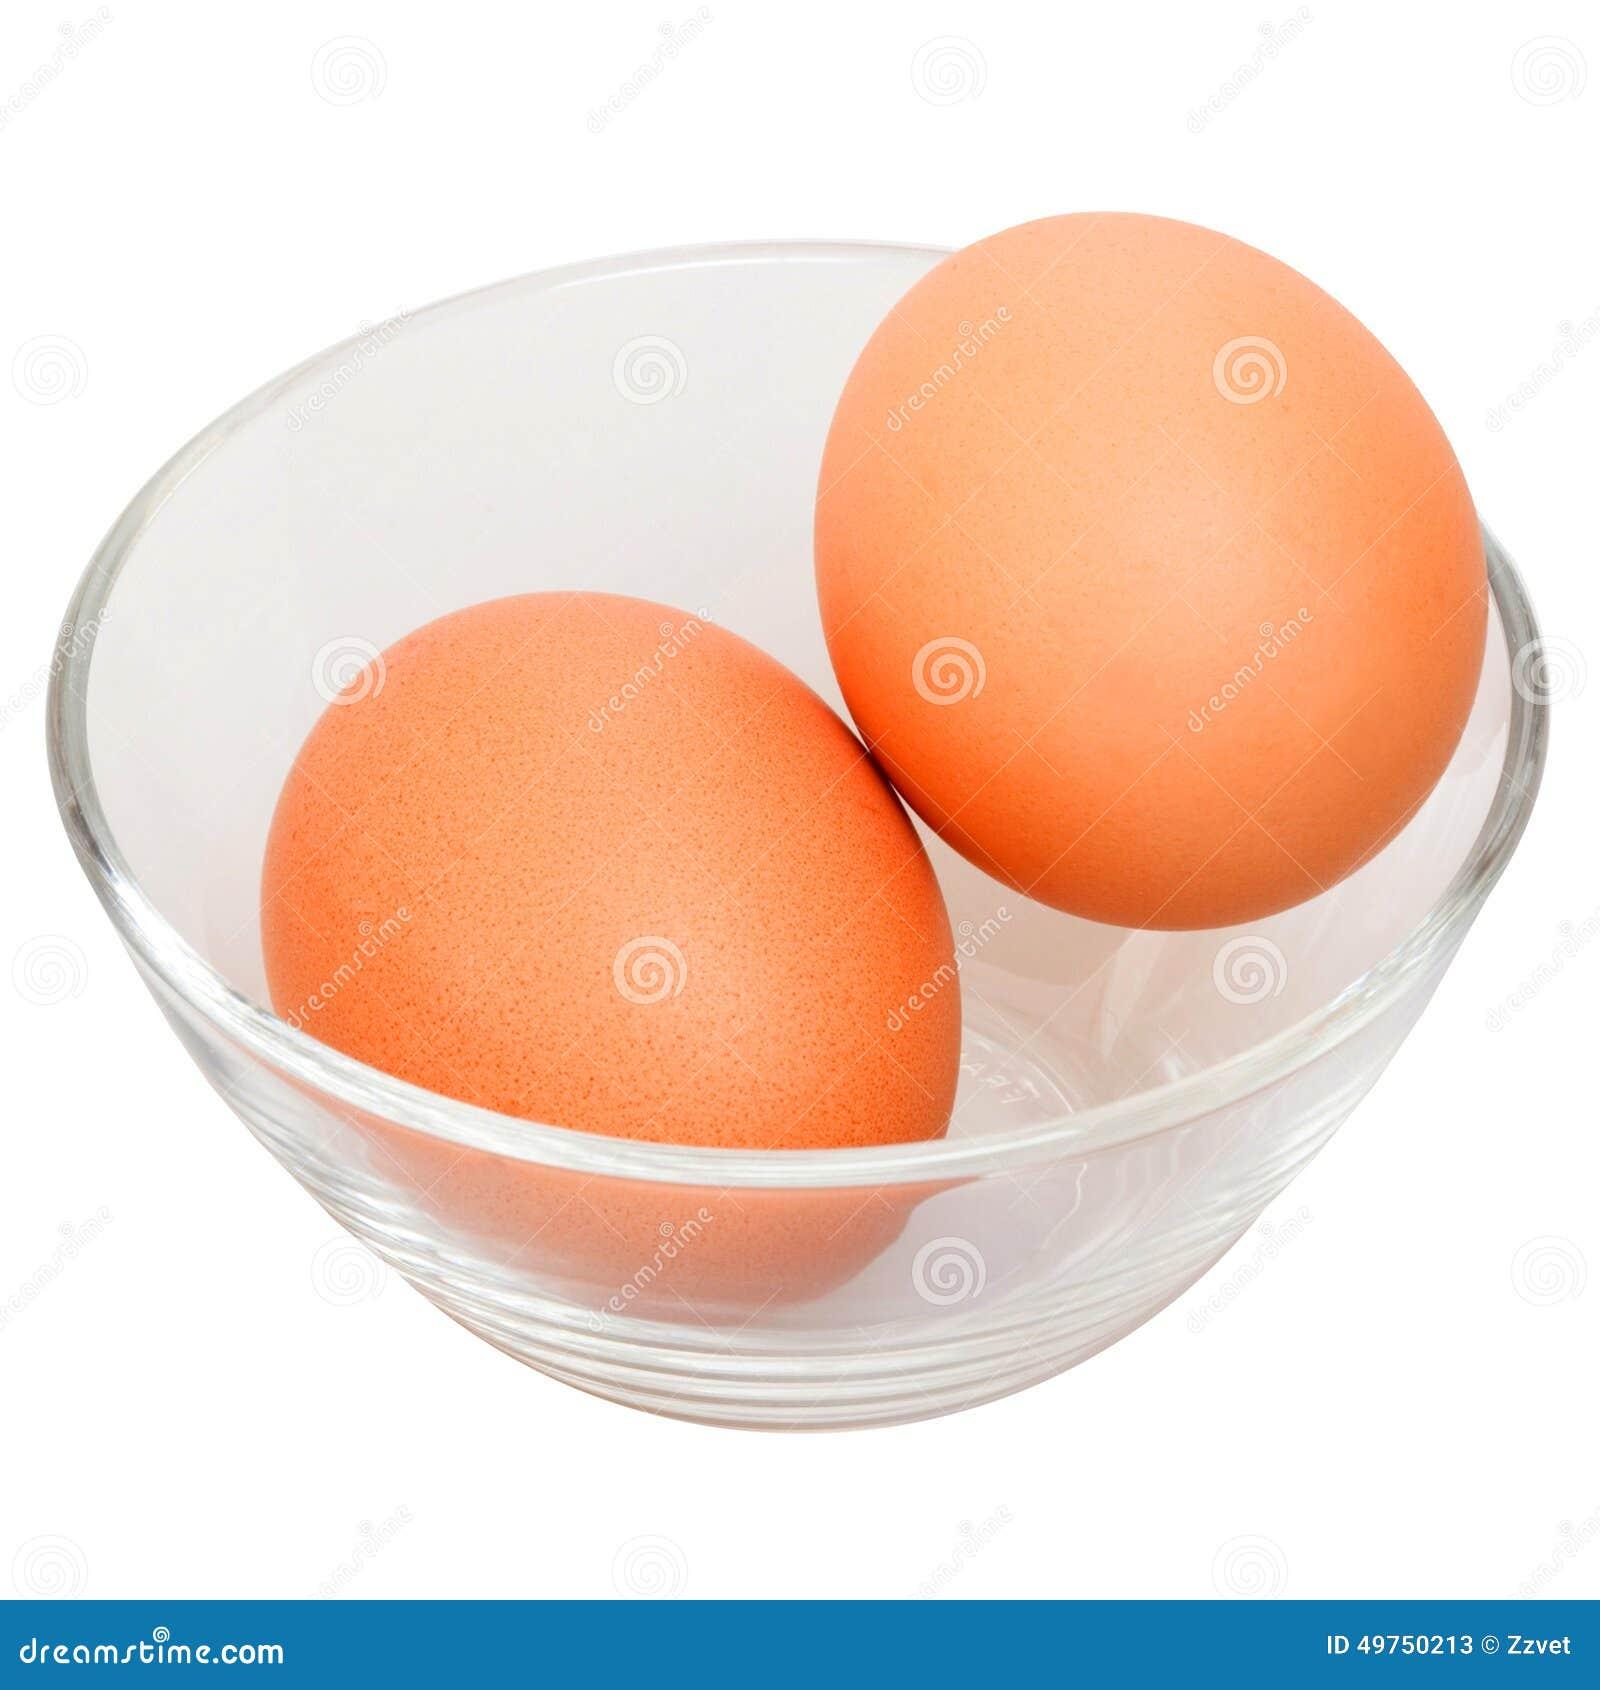 Dos huevos crudos en bol de vidrio imagen de archivo - Bol de vidrio ...